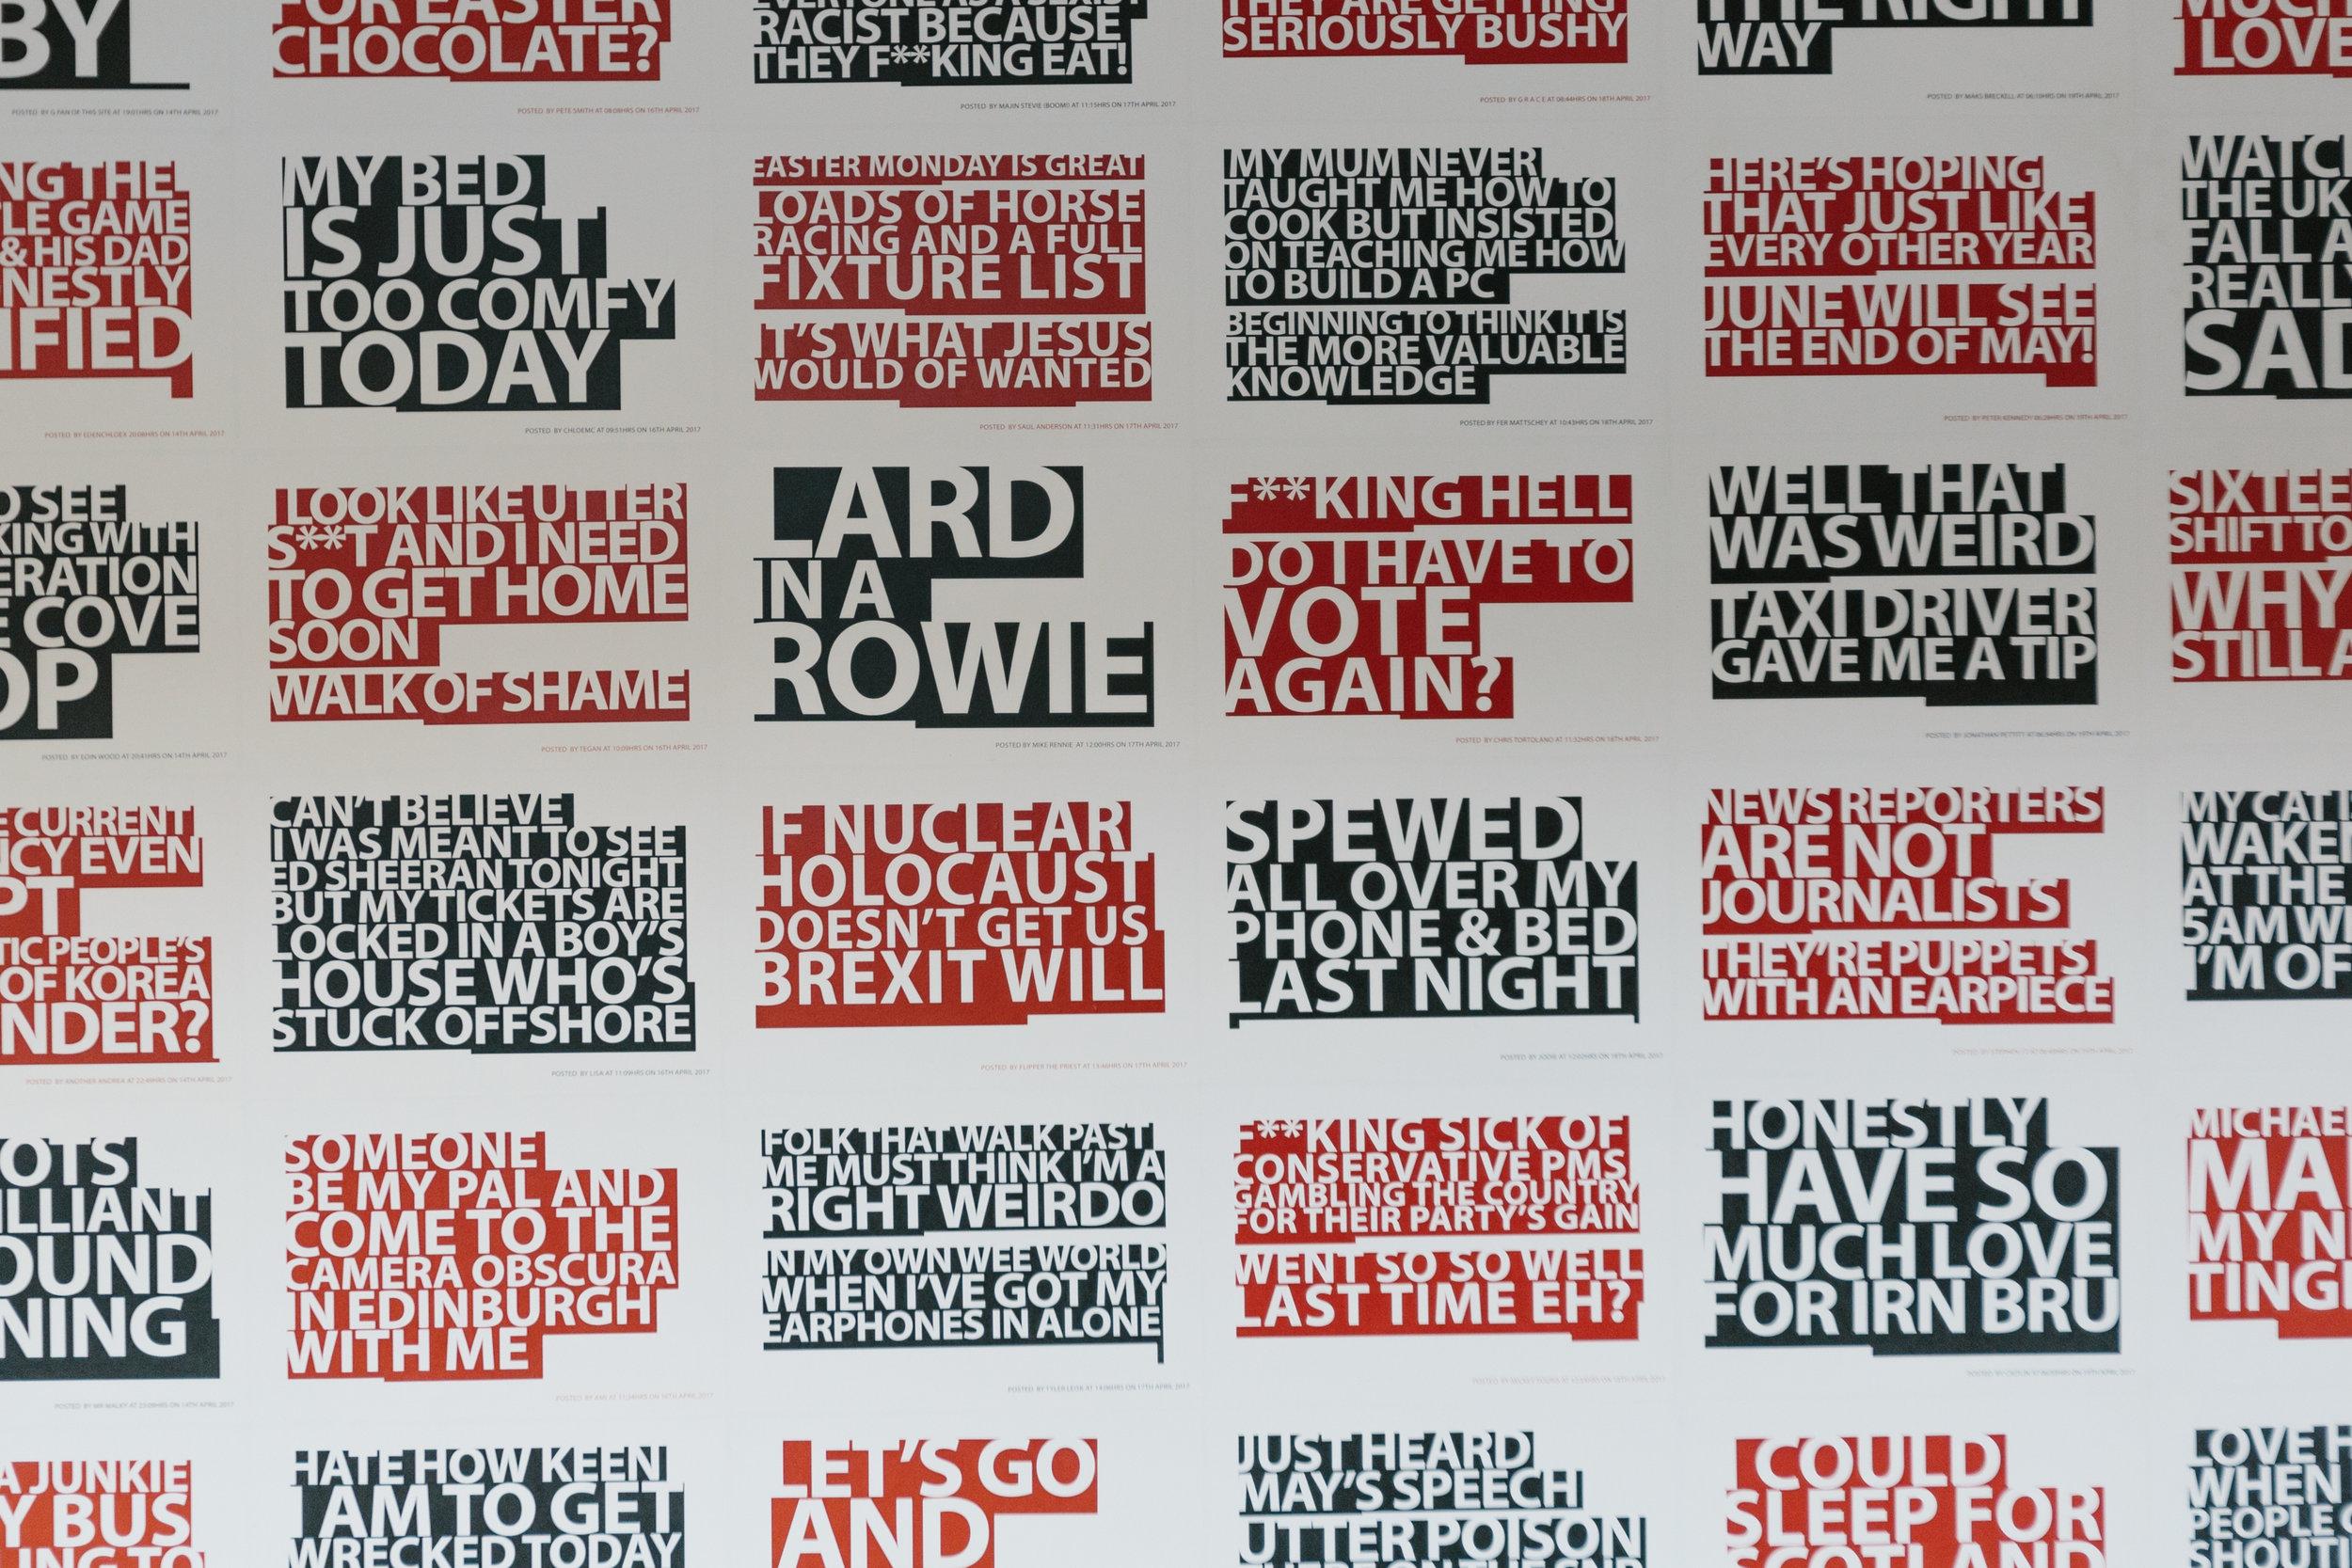 Aberdeen Wall_thomson + Craighead.jpg